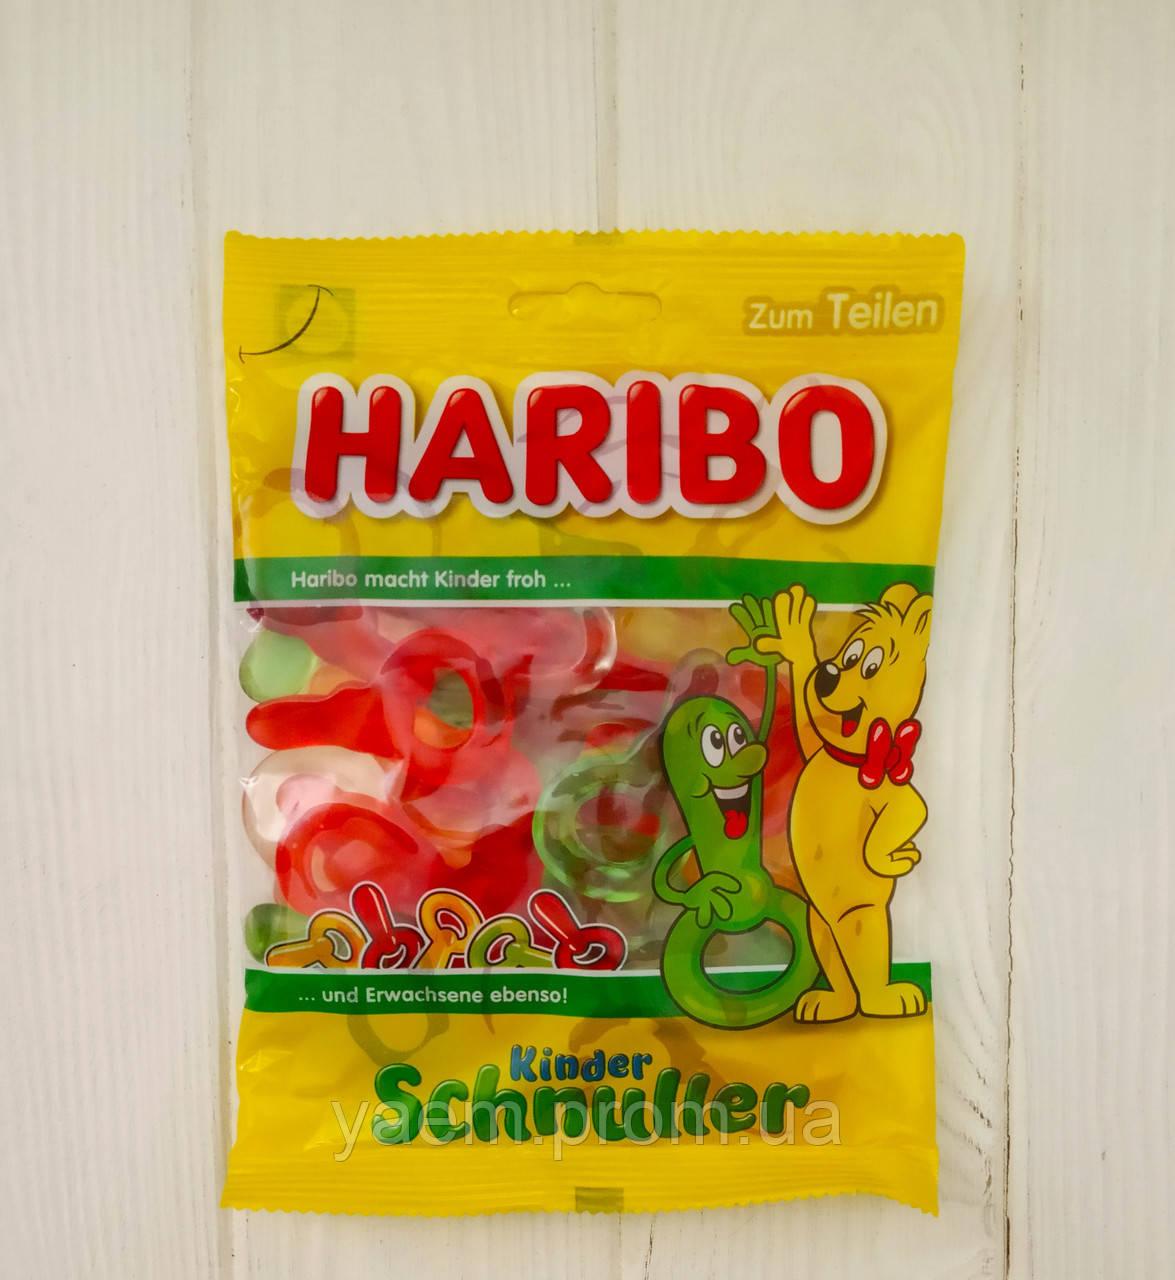 Желейные конфеты Haribo Kinder Schnuller 200гр. (Германия)